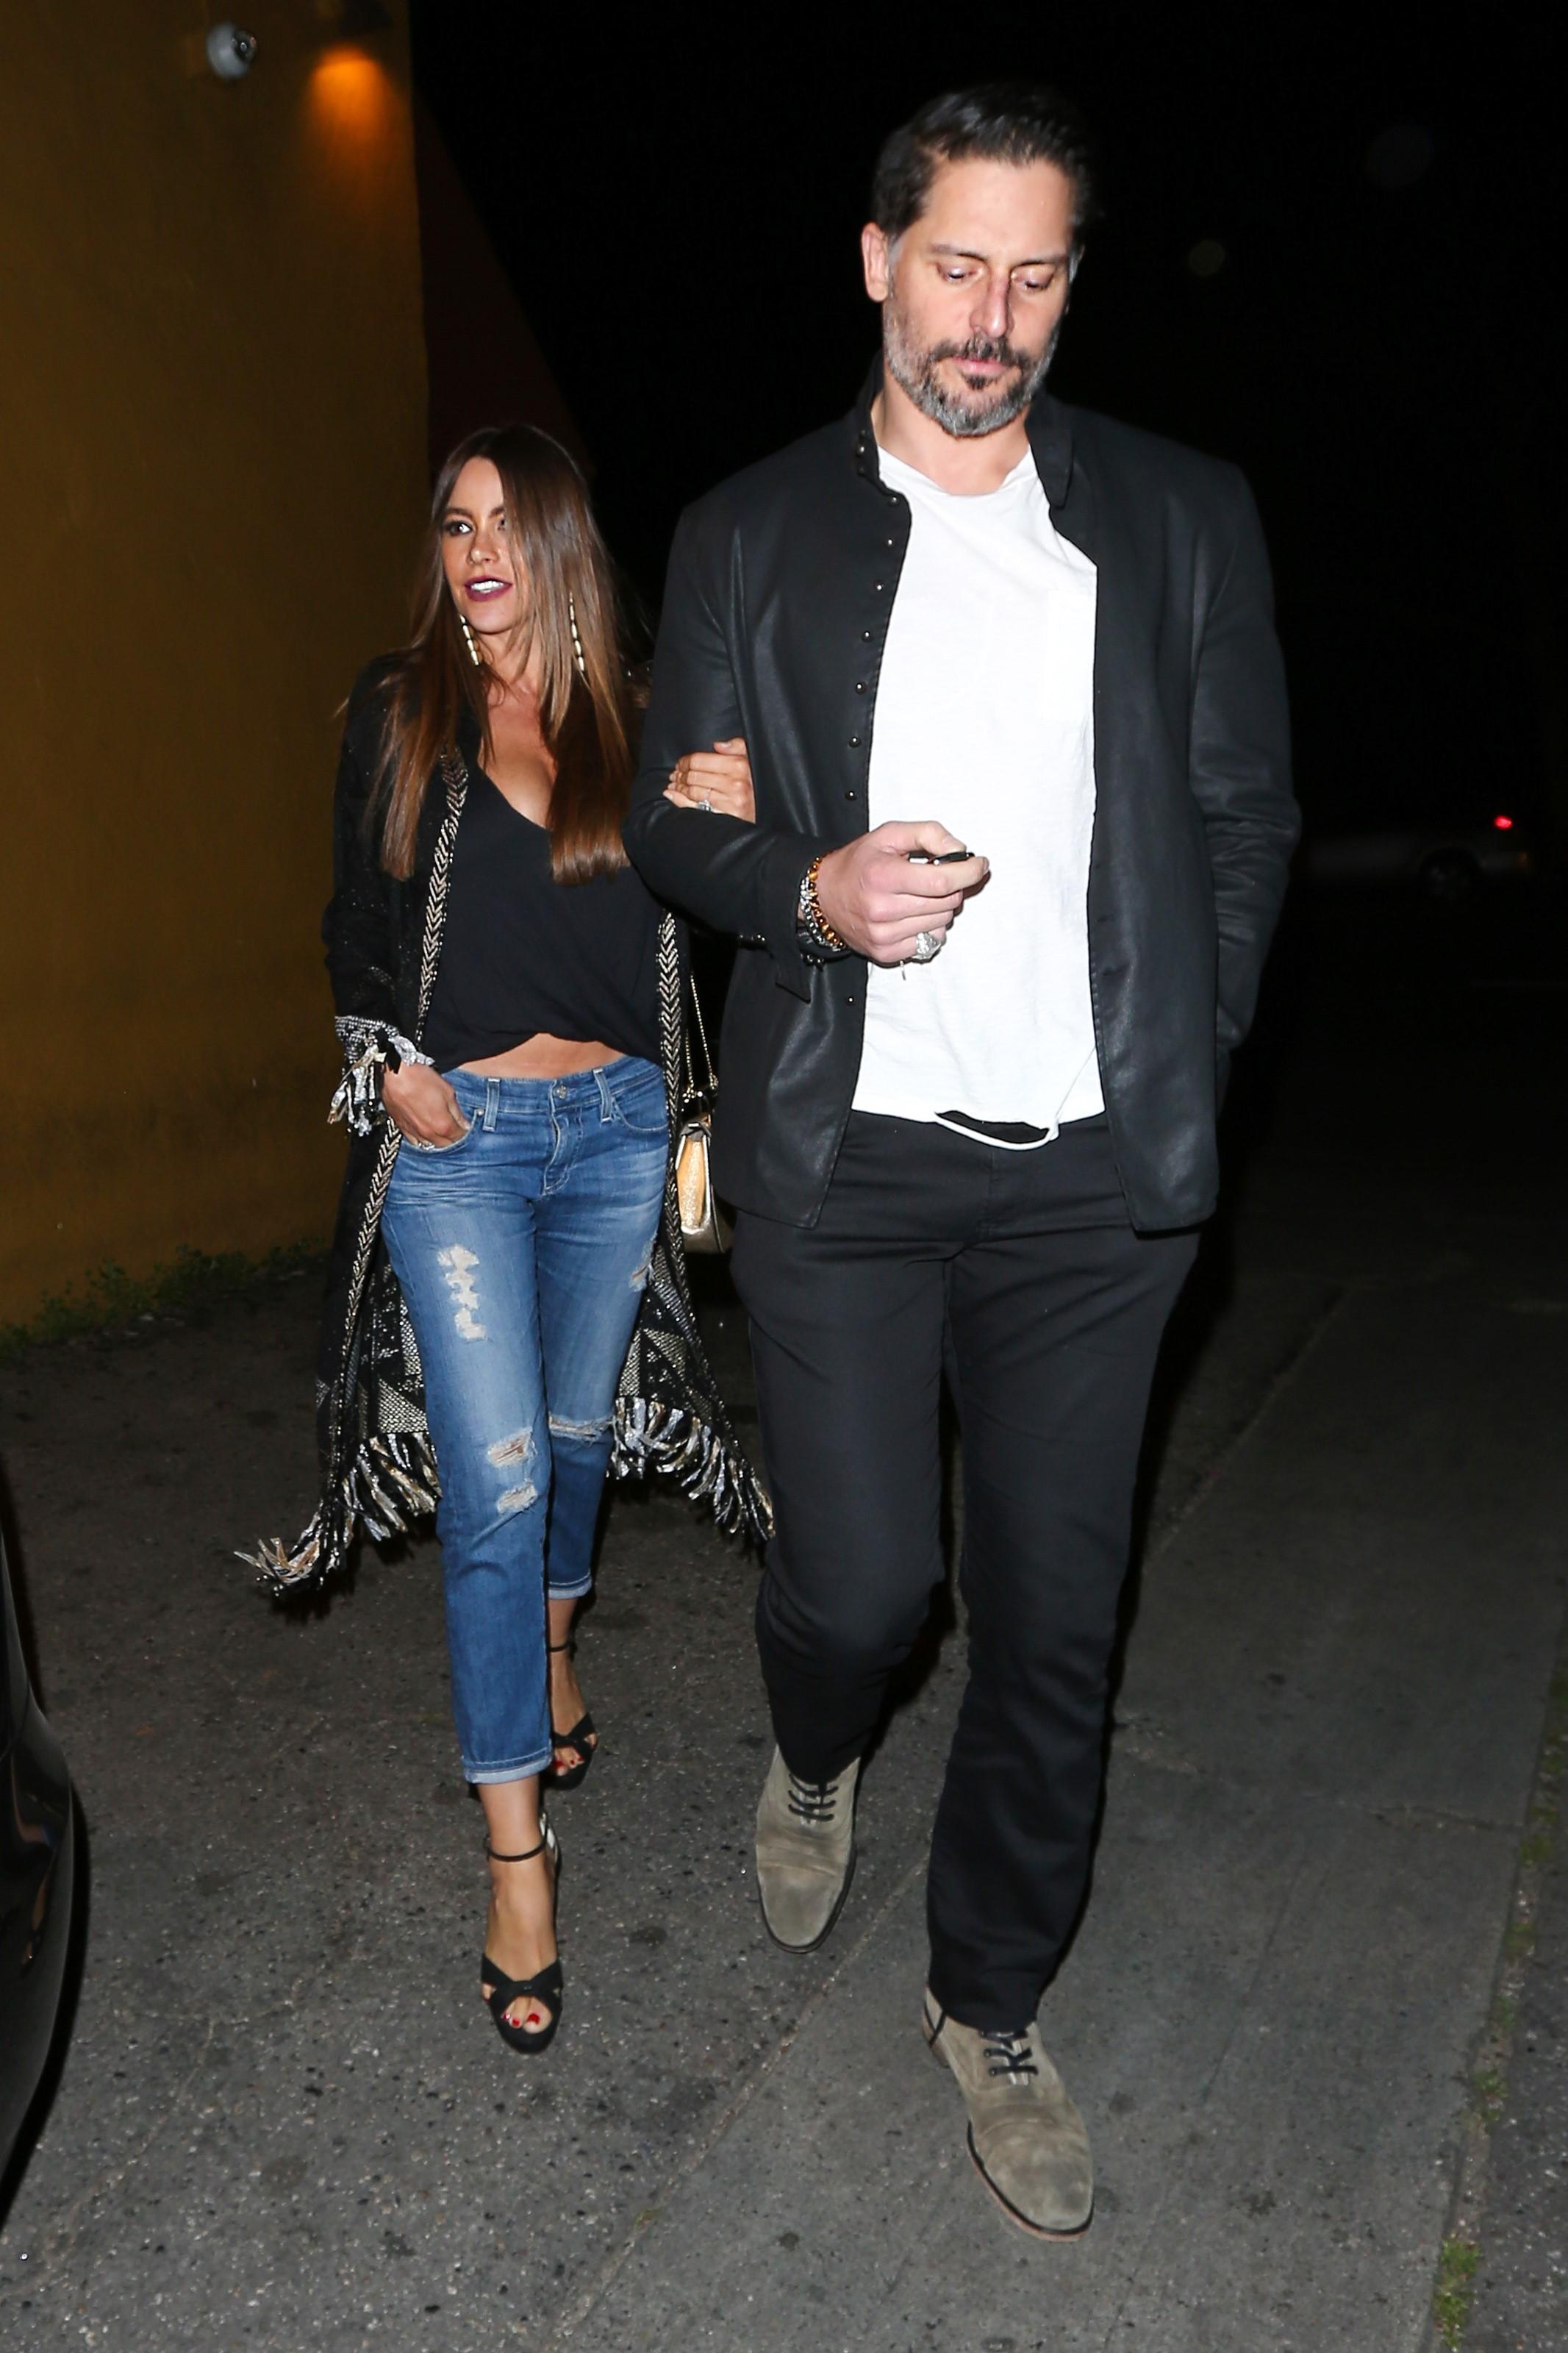 EXCLUSIVE Sofia Vergara Flashes Some Cleavage As She Enjoys Date Night With Husband Joe Manganiello